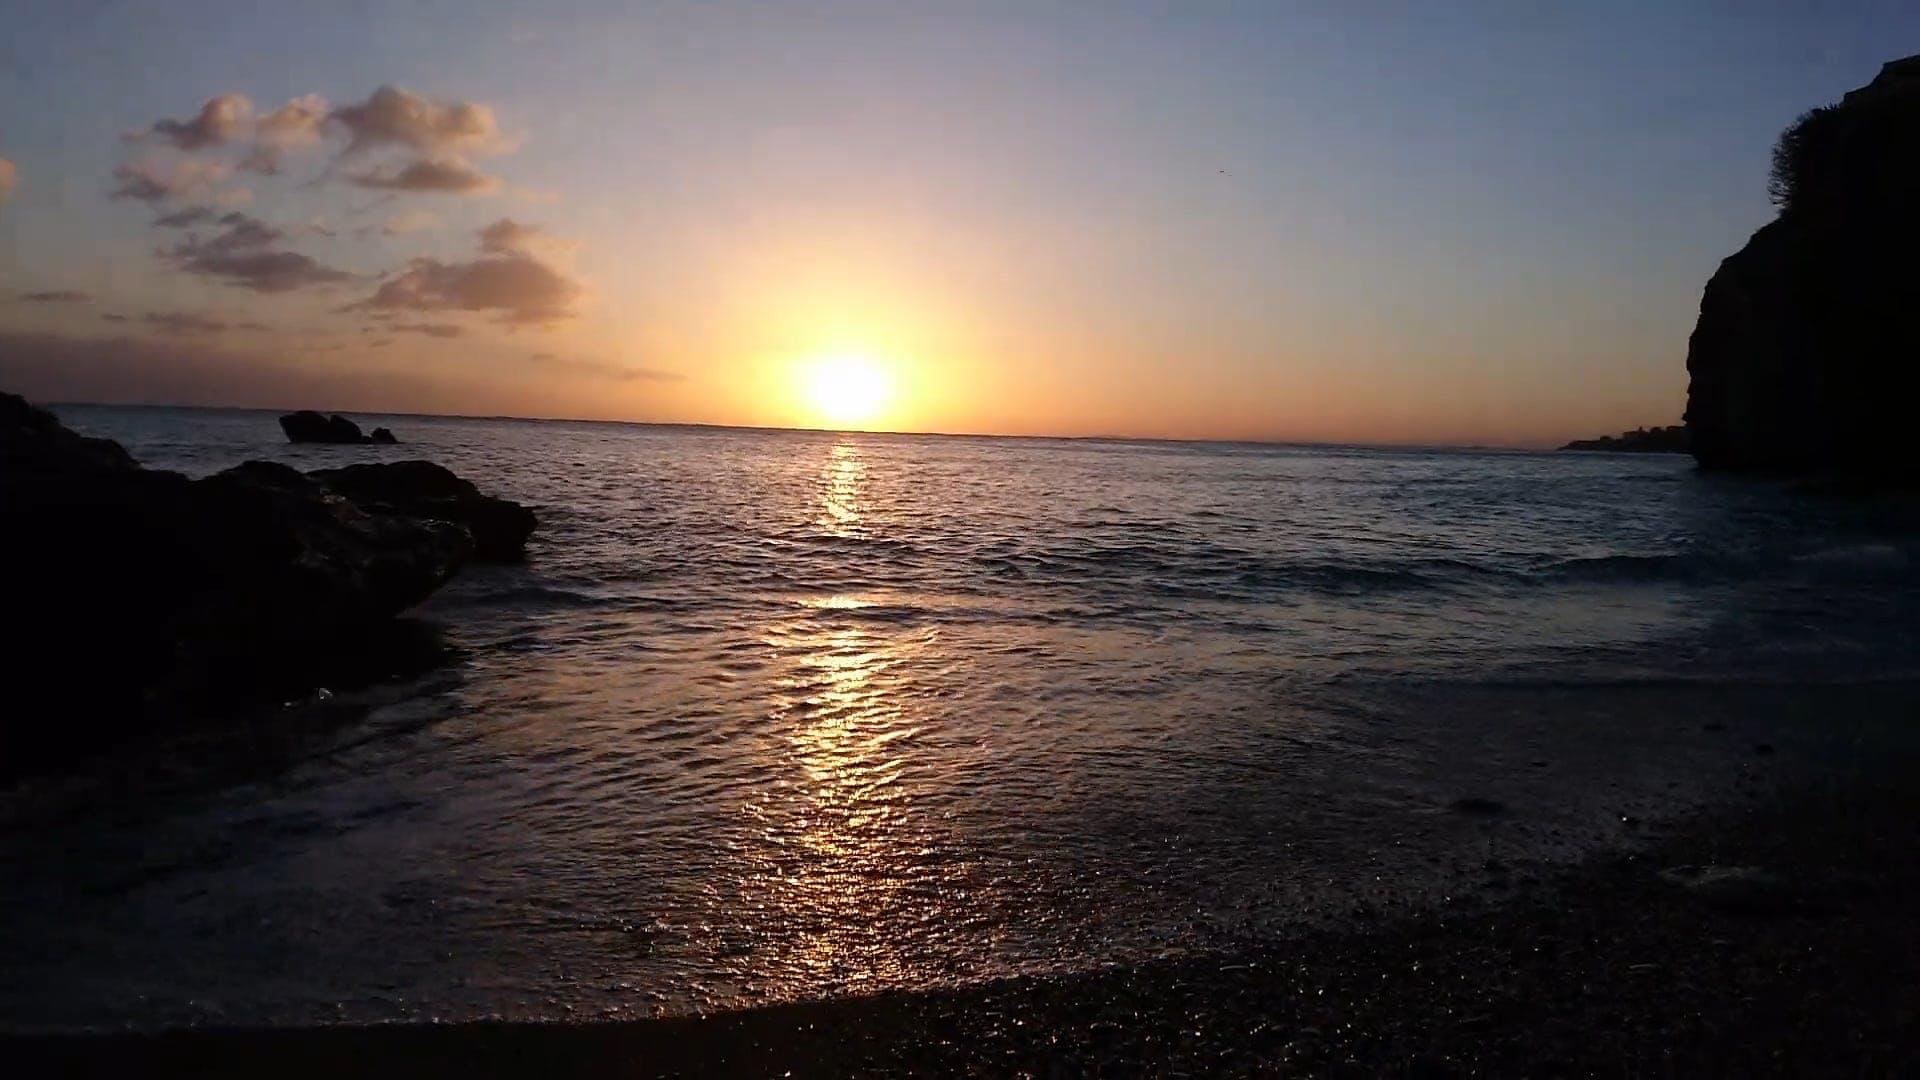 Waves Crashing On Shore During Sunset